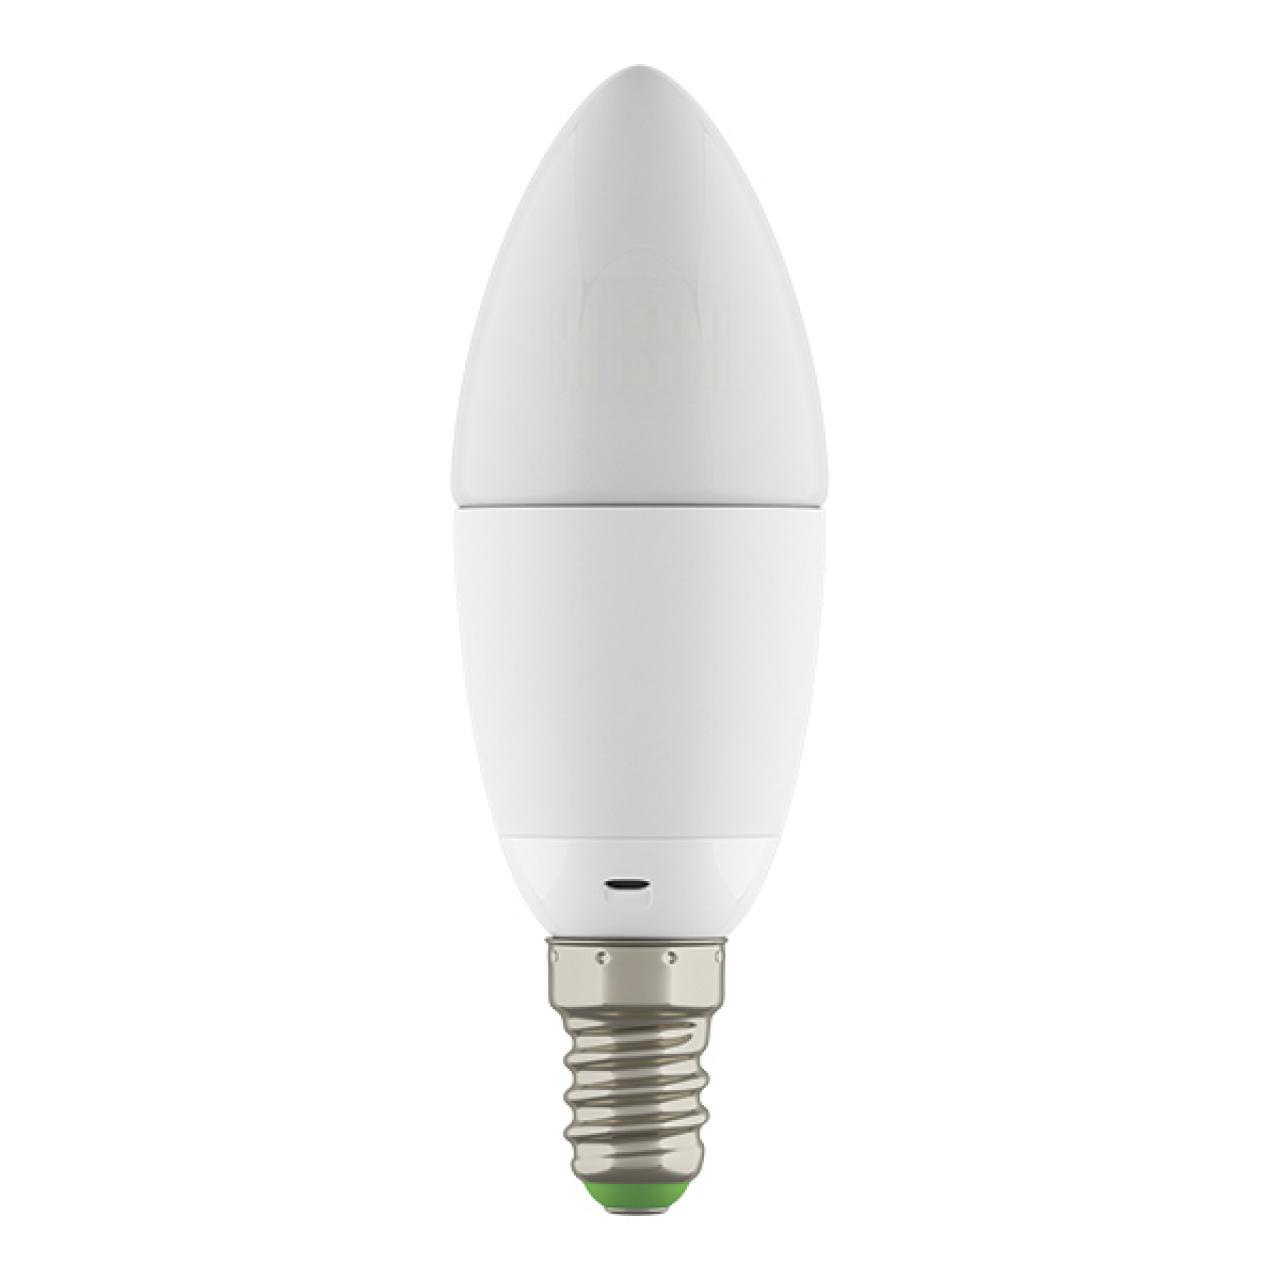 Лампа LED 220V C35 E14 6W=60W 360G WH 2800-3000K 20000H DIMM Lightstar 931502